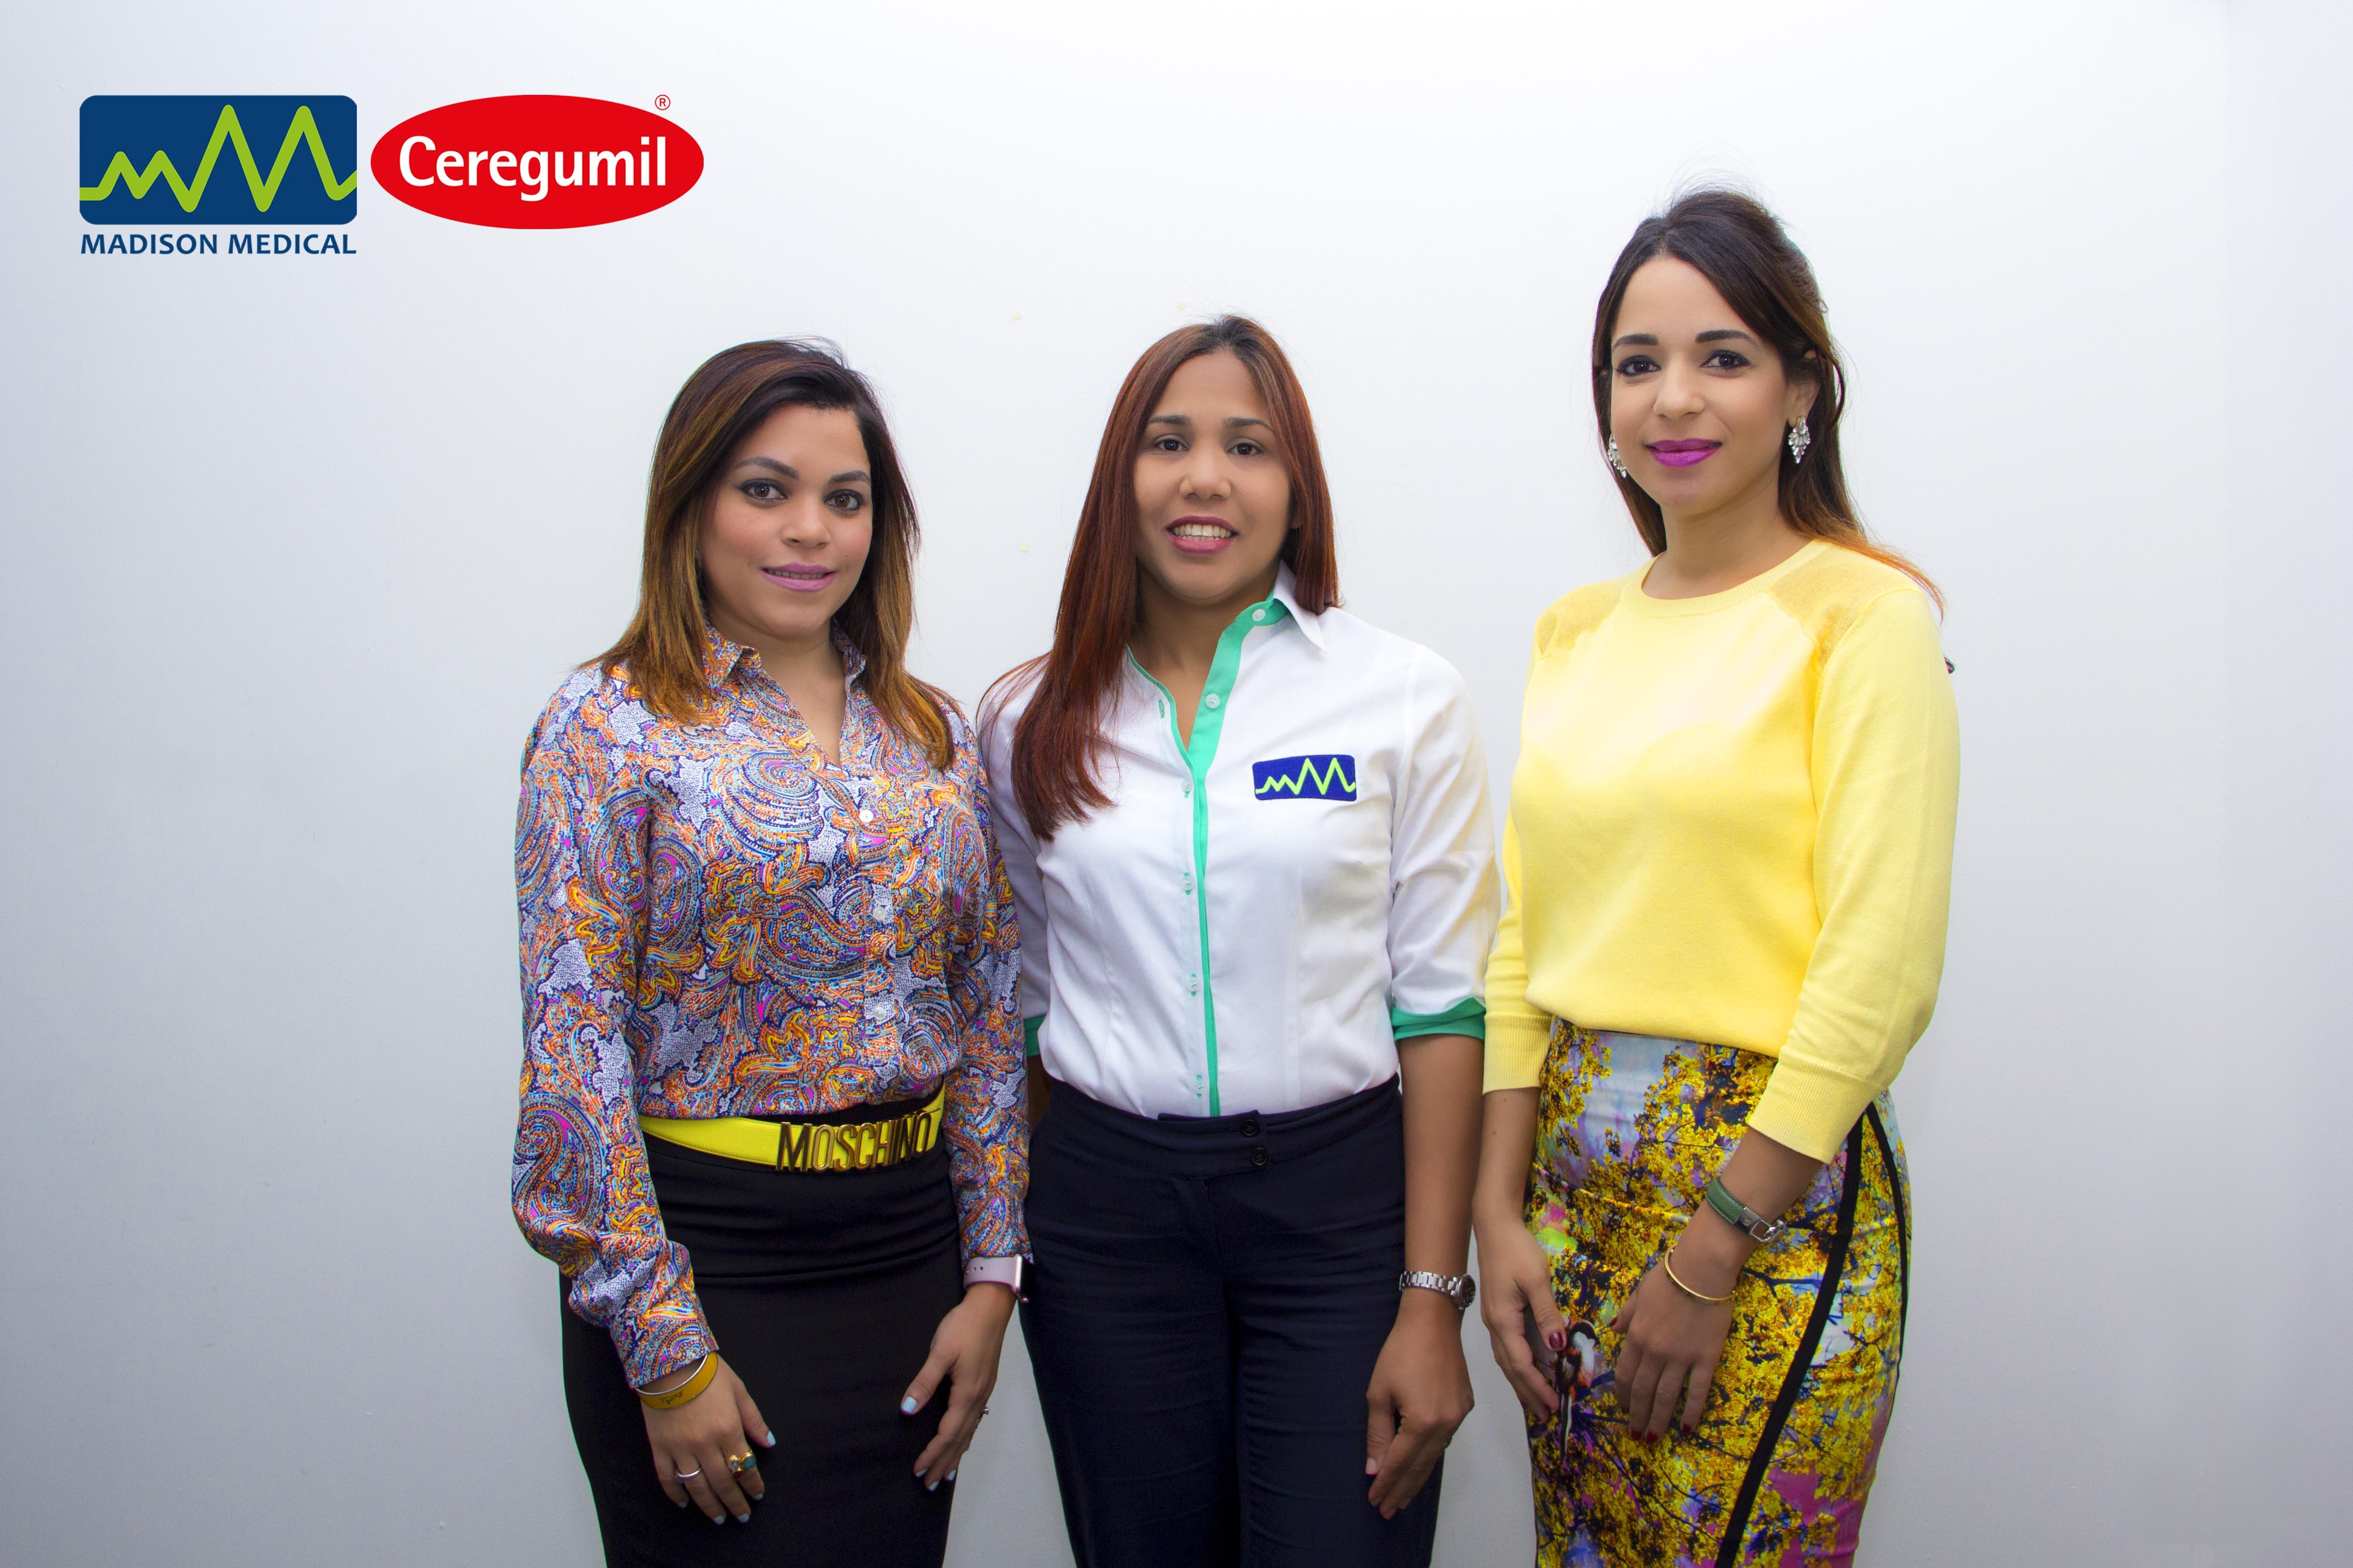 Carolina Acosta, Ruth Castillo y Cinty Acosta